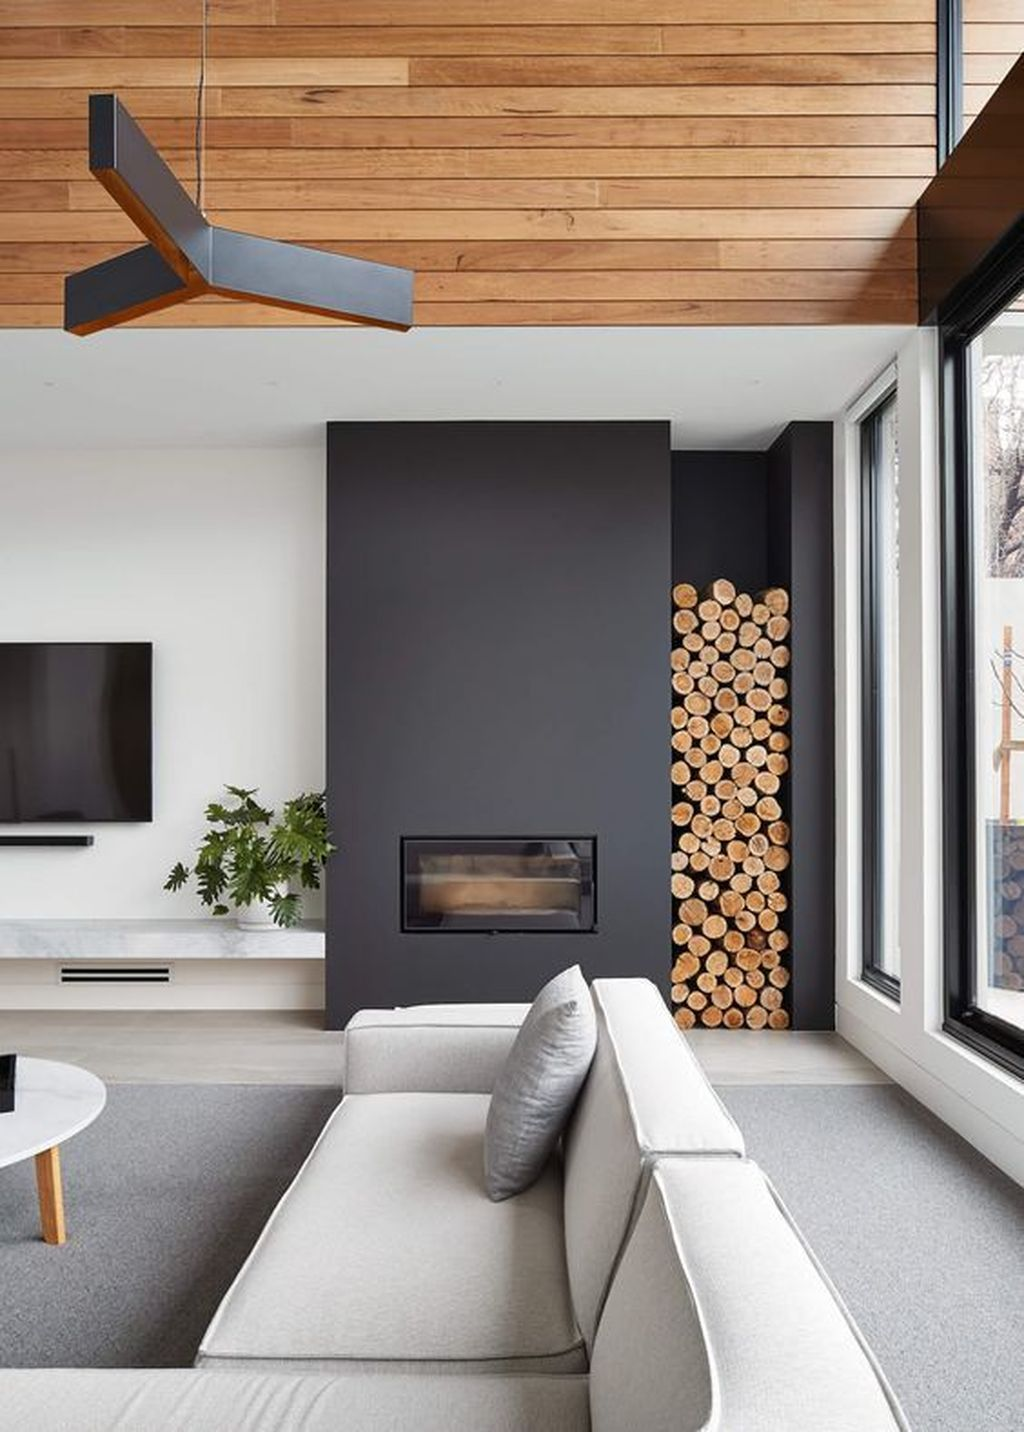 Admirable Modern Interior Design Ideas You Never Seen Before 23